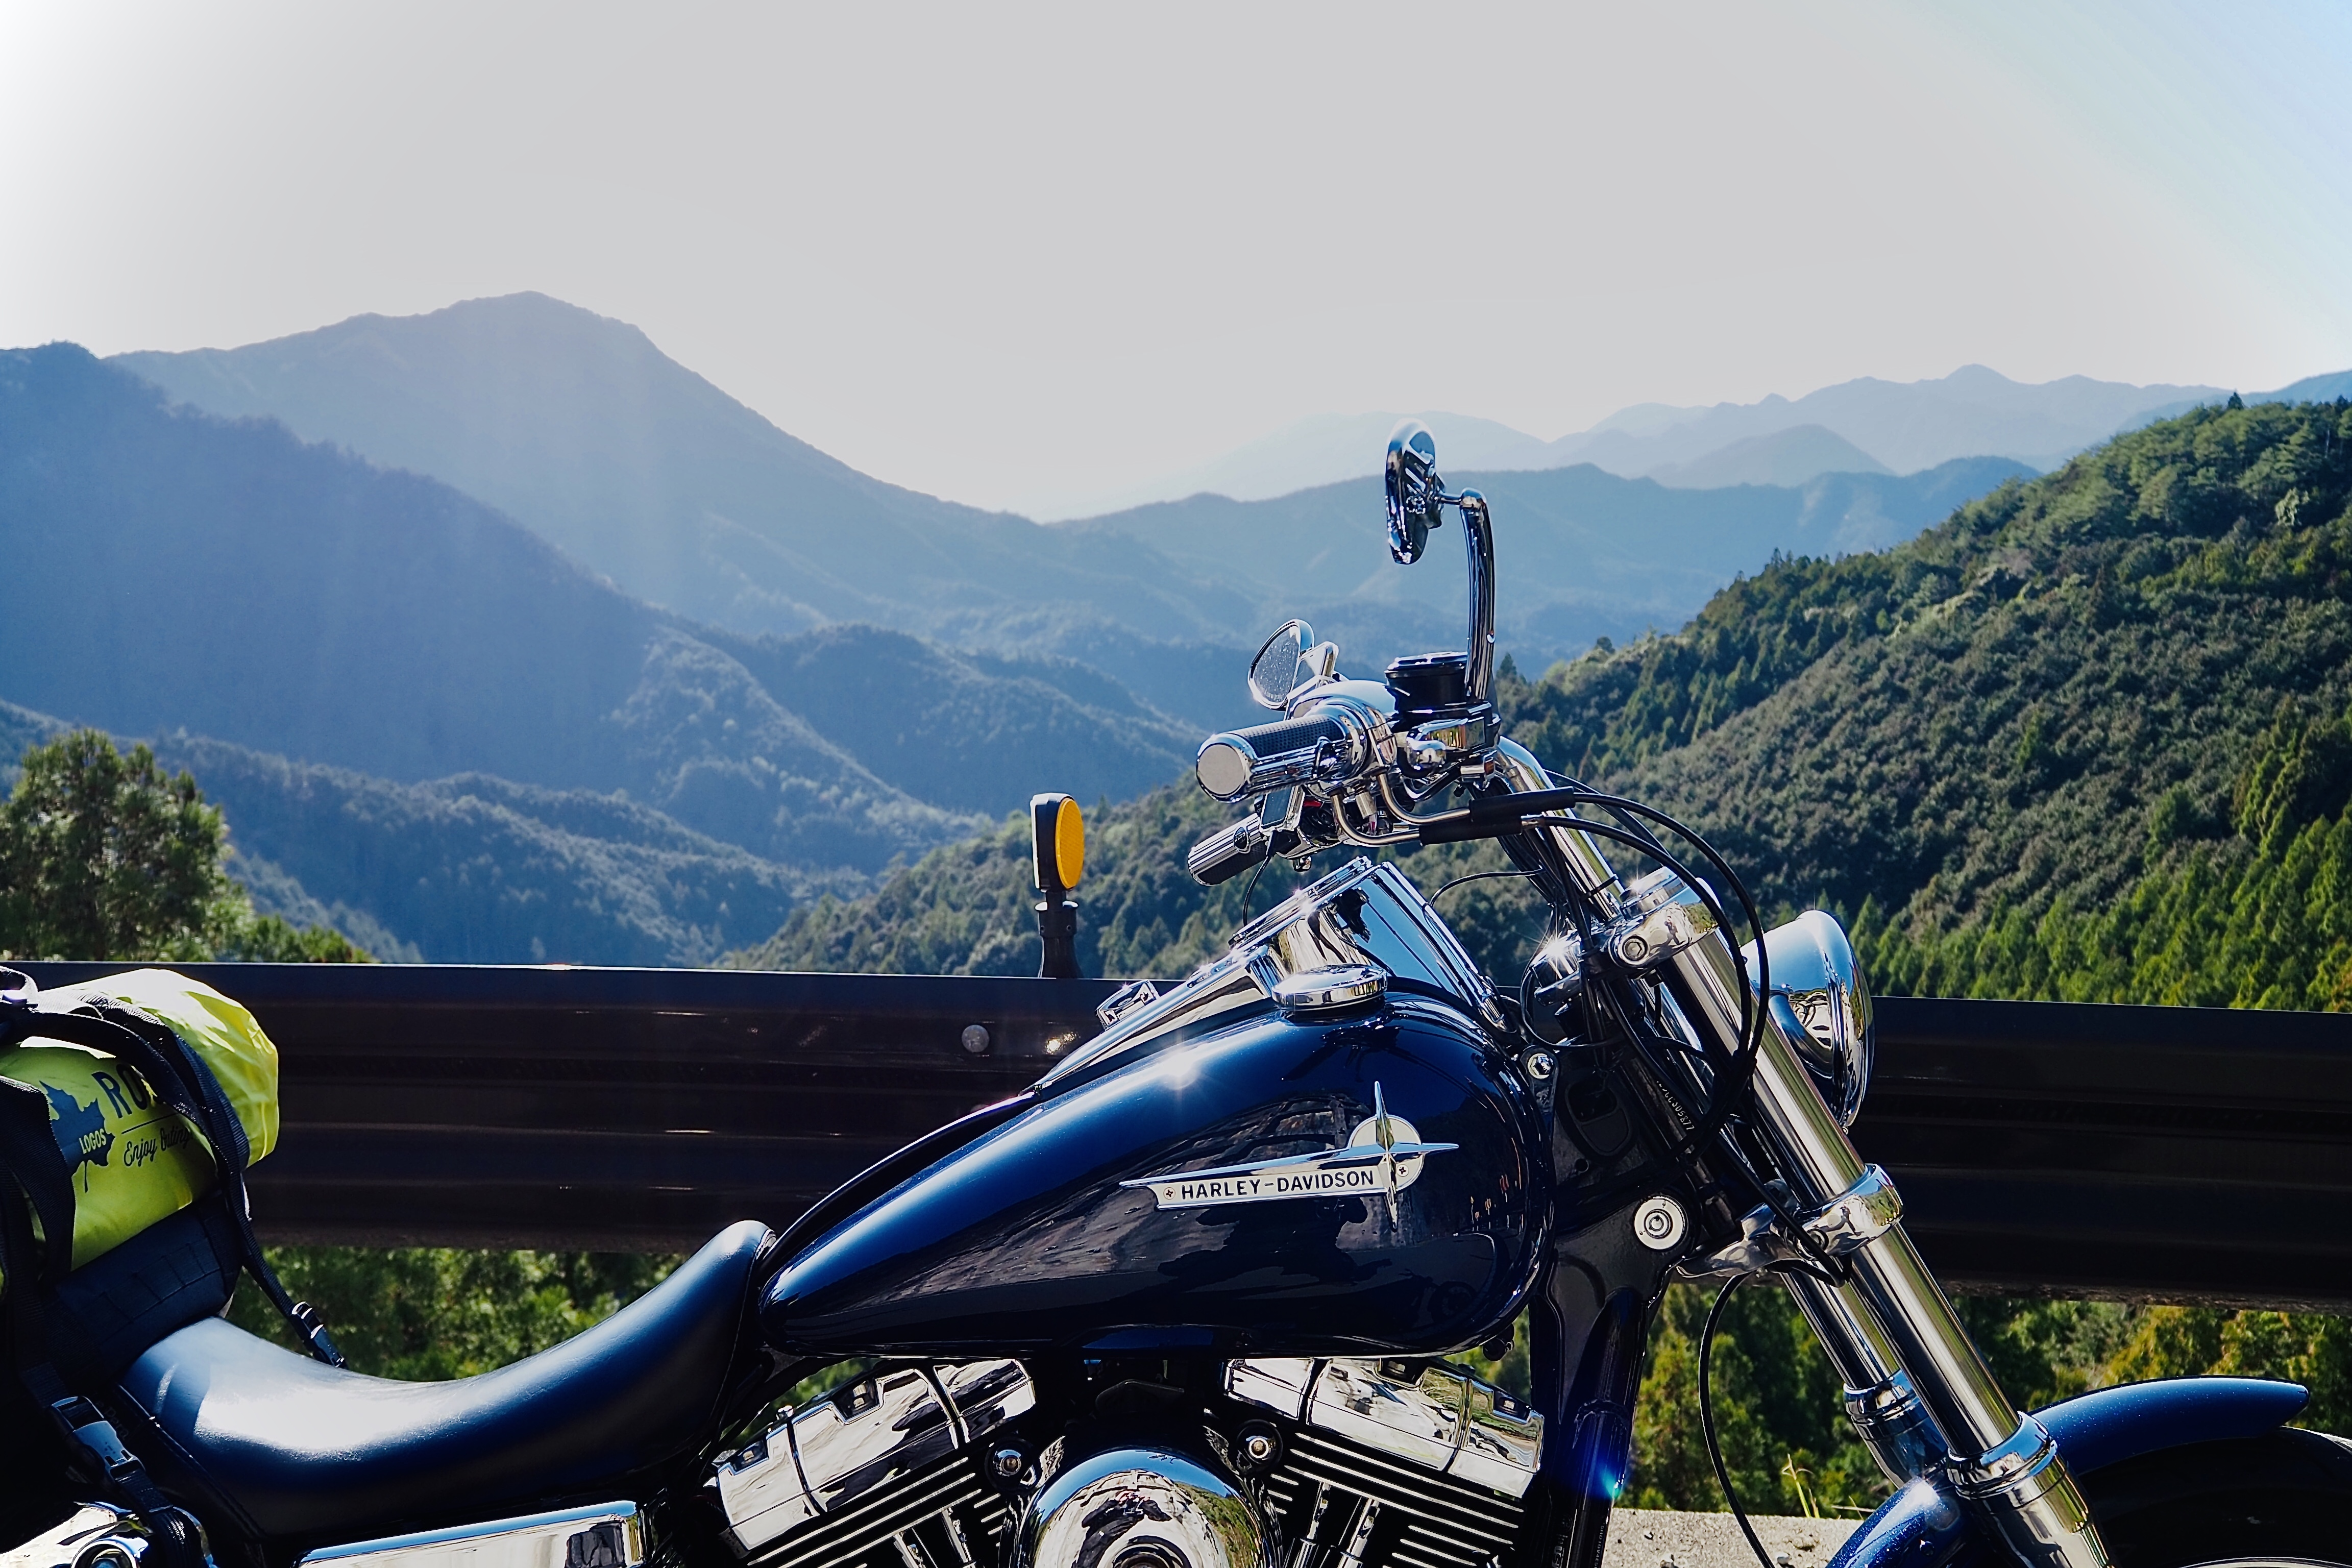 harleydavidson-motorcycle-touring-blog-wakayama-mountainroad-okutoro.jpg